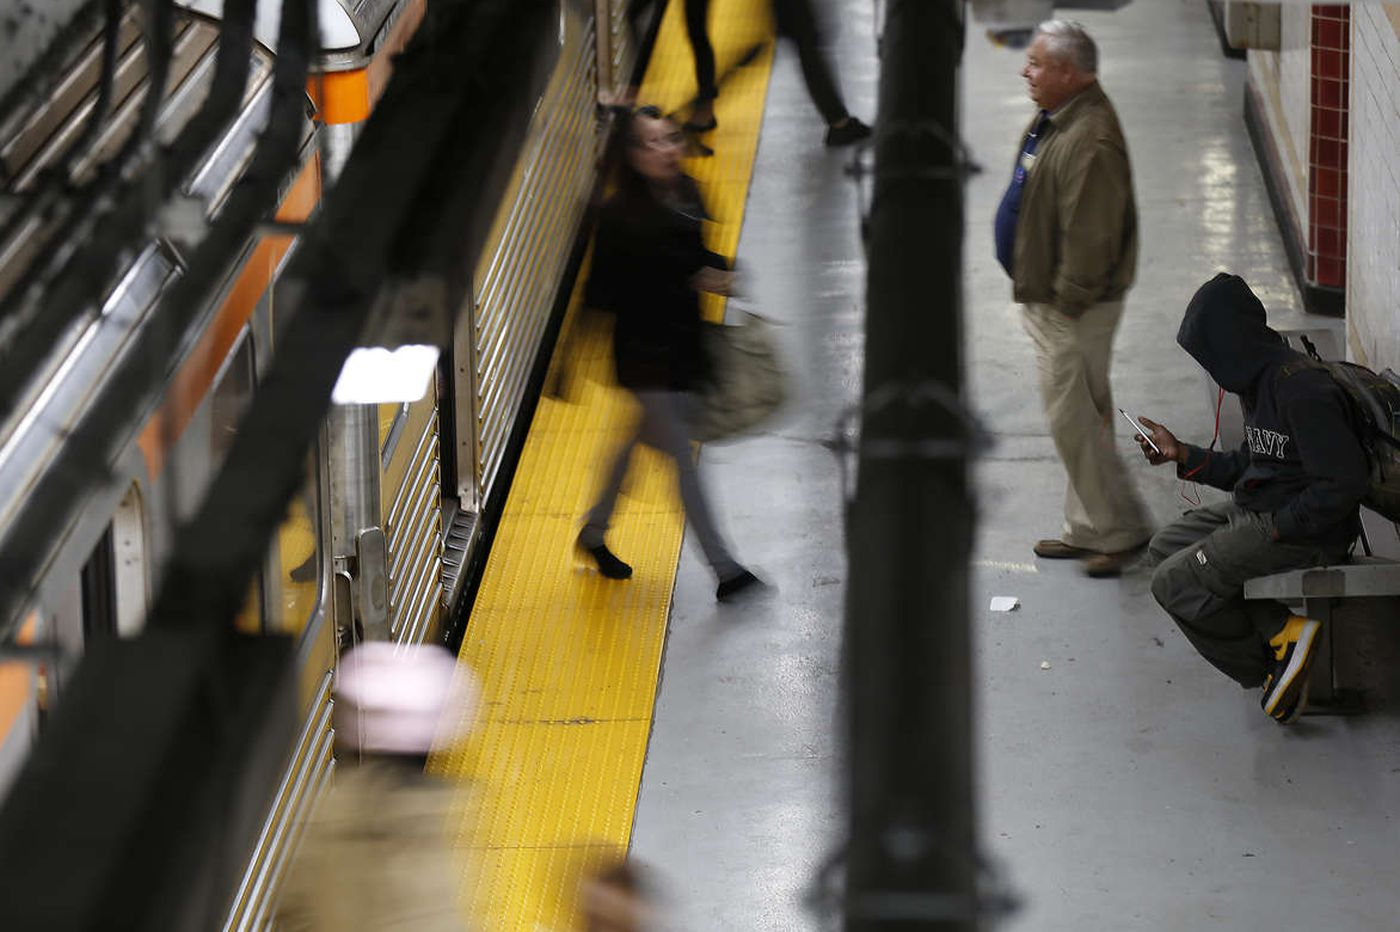 Man struck and killed by SEPTA train near Oregon Station